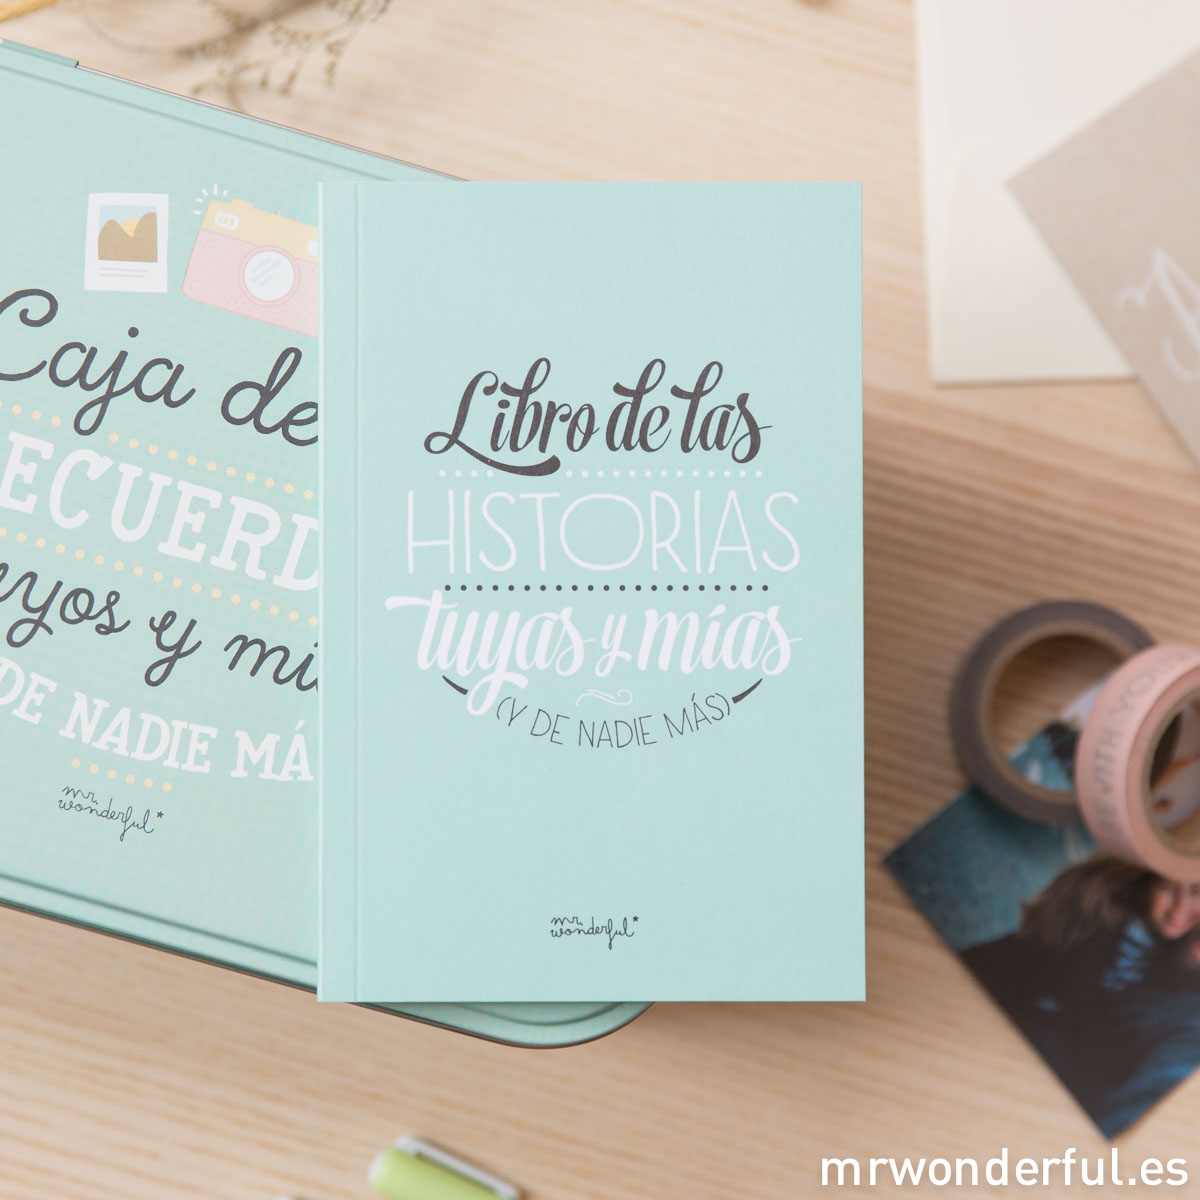 mrwonderful_WOM02855_8435460703192_caja-metalica_libro_CAST-3